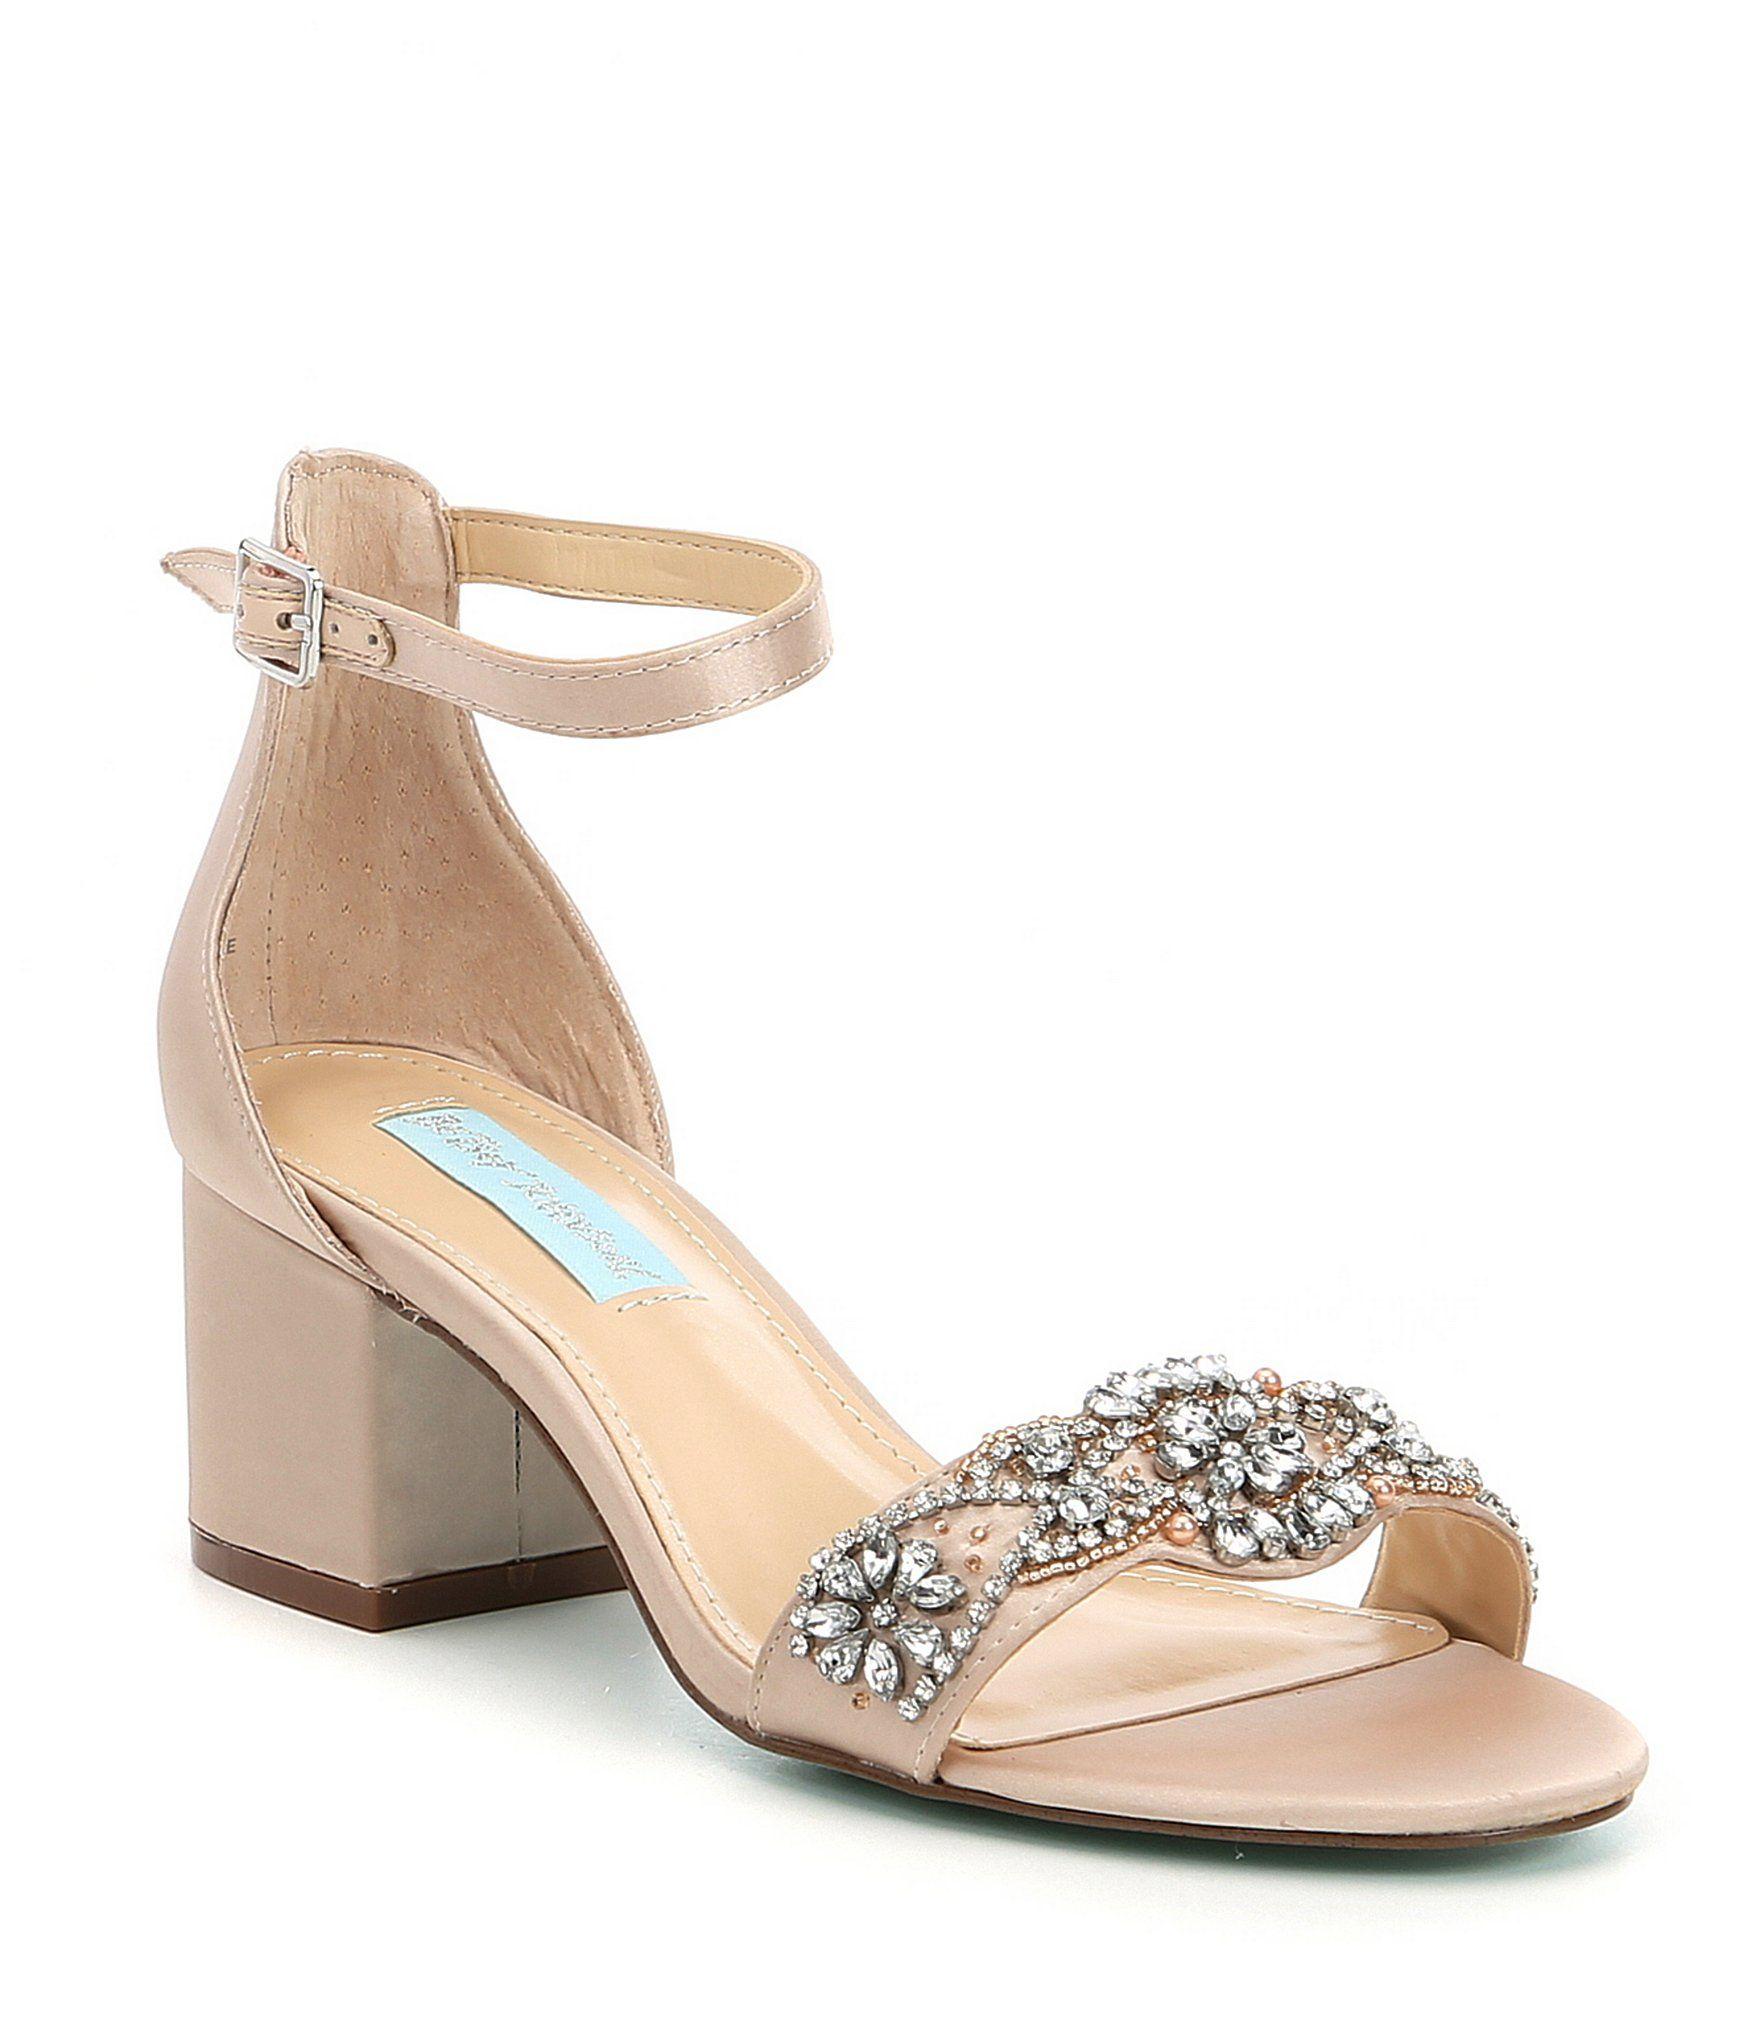 45092cc838 Blue by Betsey Johnson Mel Bejeweled Satin Block Heel Dress Sandals   Dillards